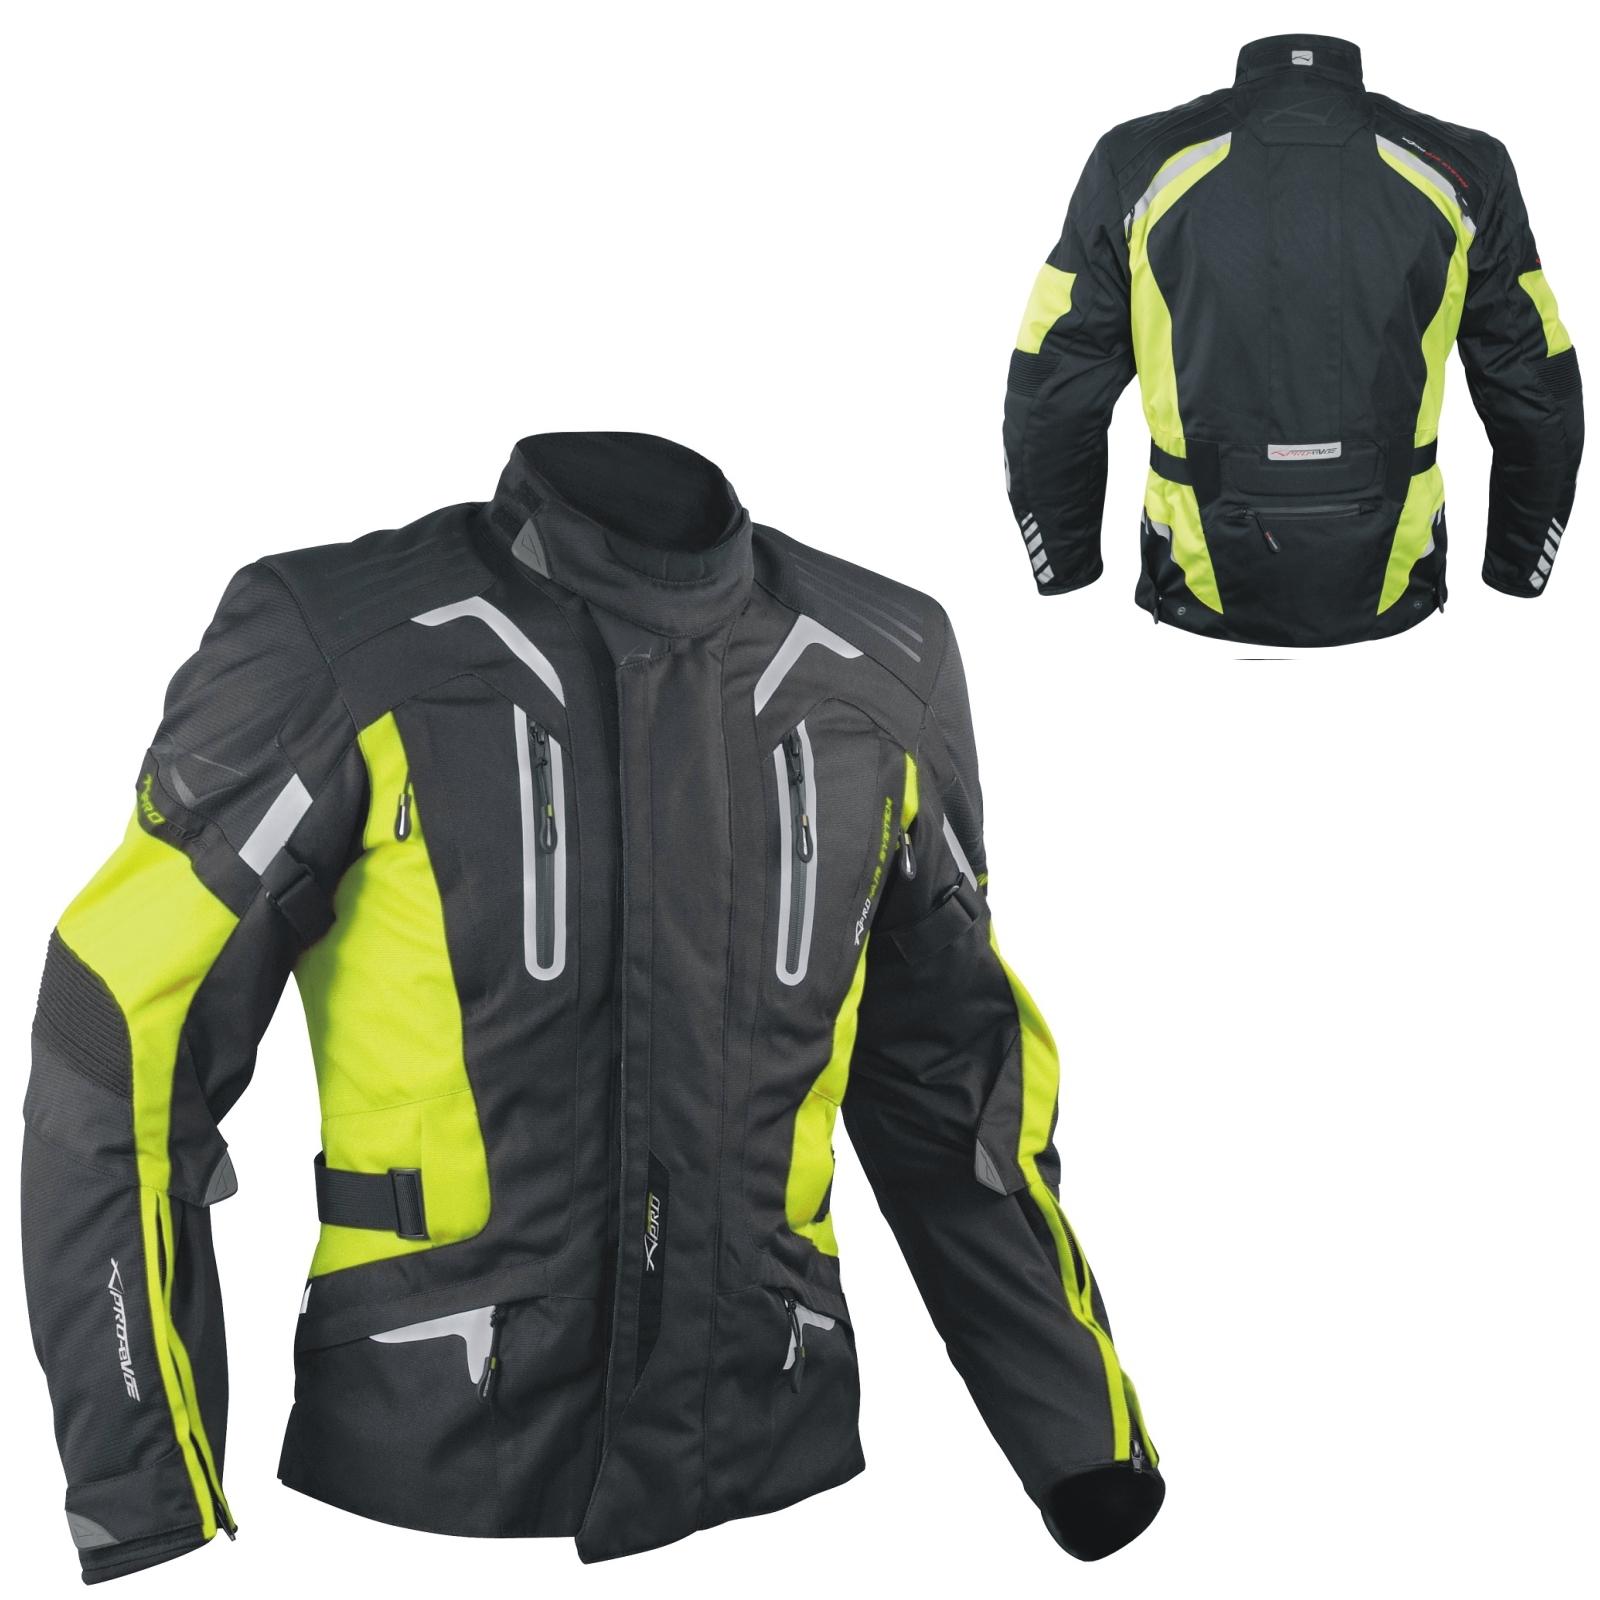 Blouson-Moto-Tissu-Veste-Impermeable-Doublure-Hivernale-Reflechissant-Respirant miniature 13